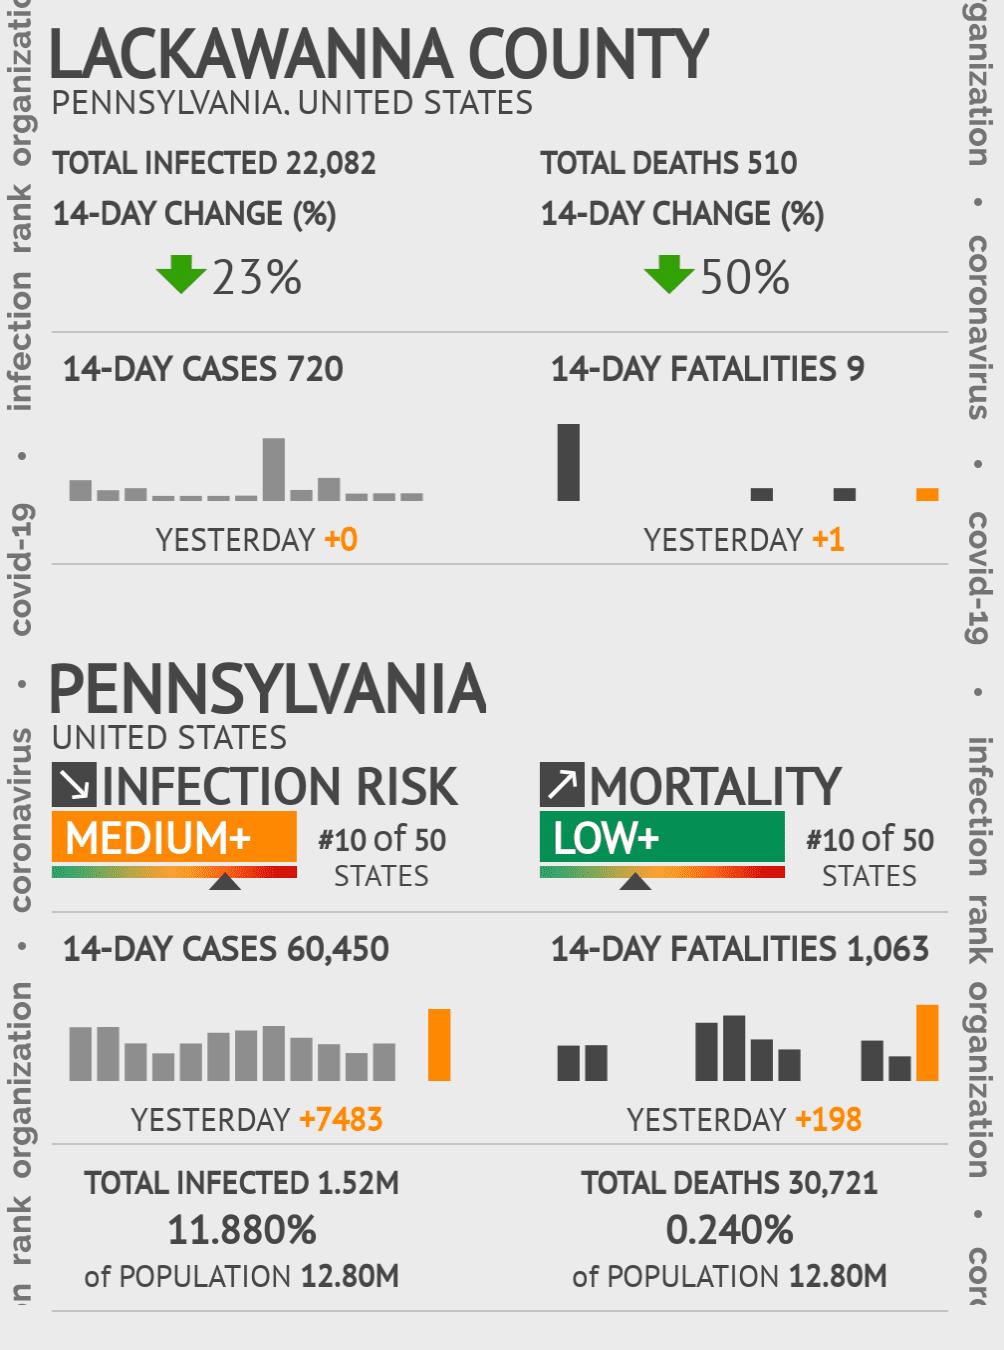 Lackawanna County Coronavirus Covid-19 Risk of Infection on October 16, 2020